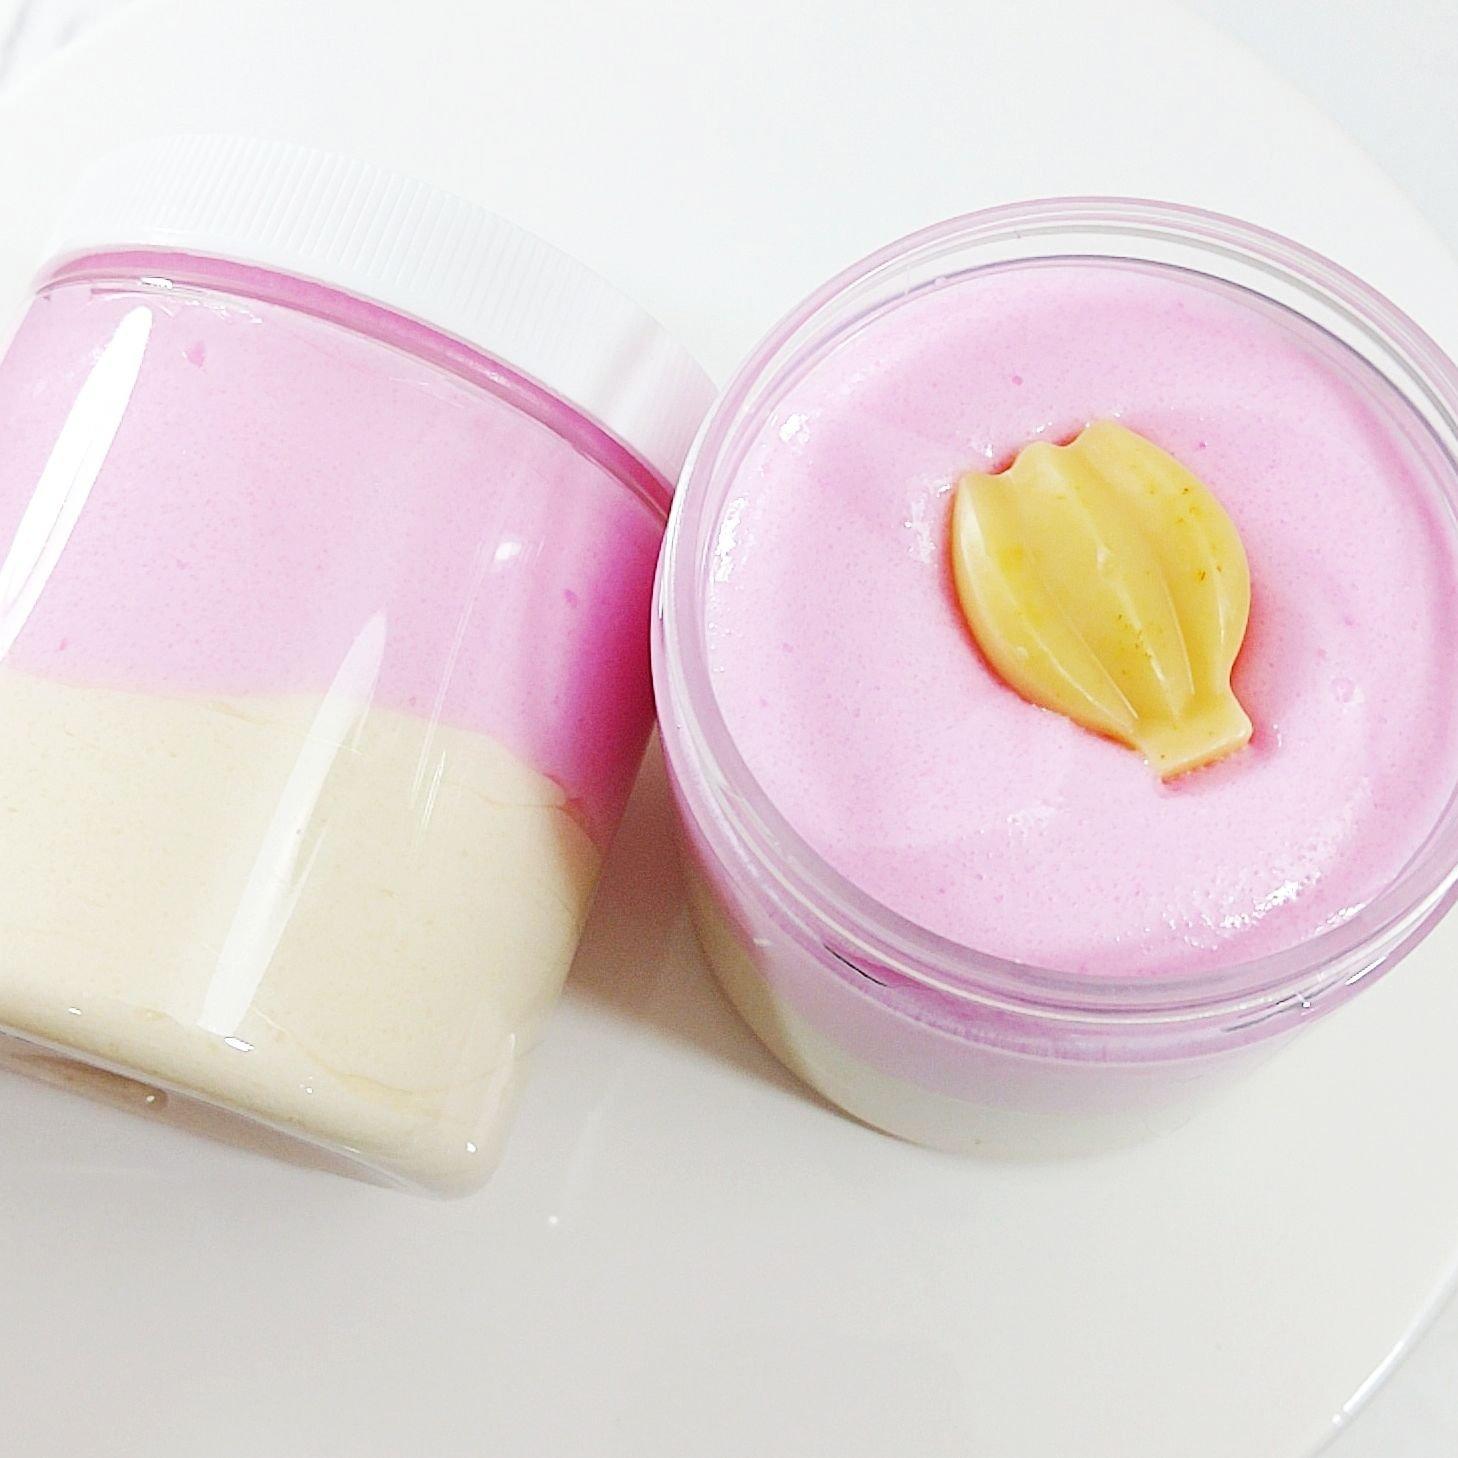 Strawberry Banana Smoothie Whipped Sugar Scrub Soap. Exfoliating Body Scrub. Summer Gift Ideas